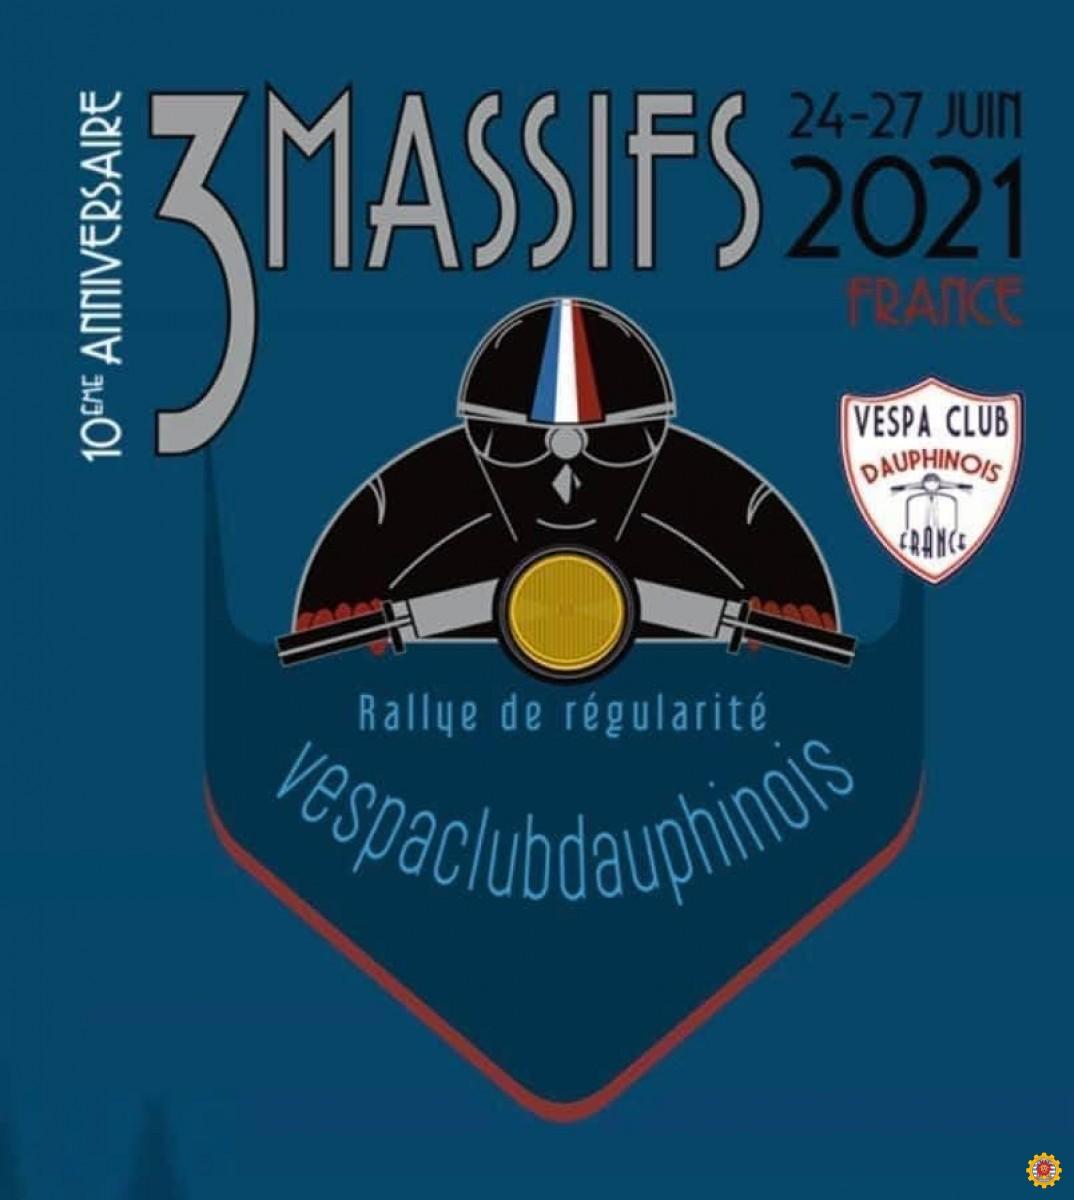 2021 Rally 3 Massifs